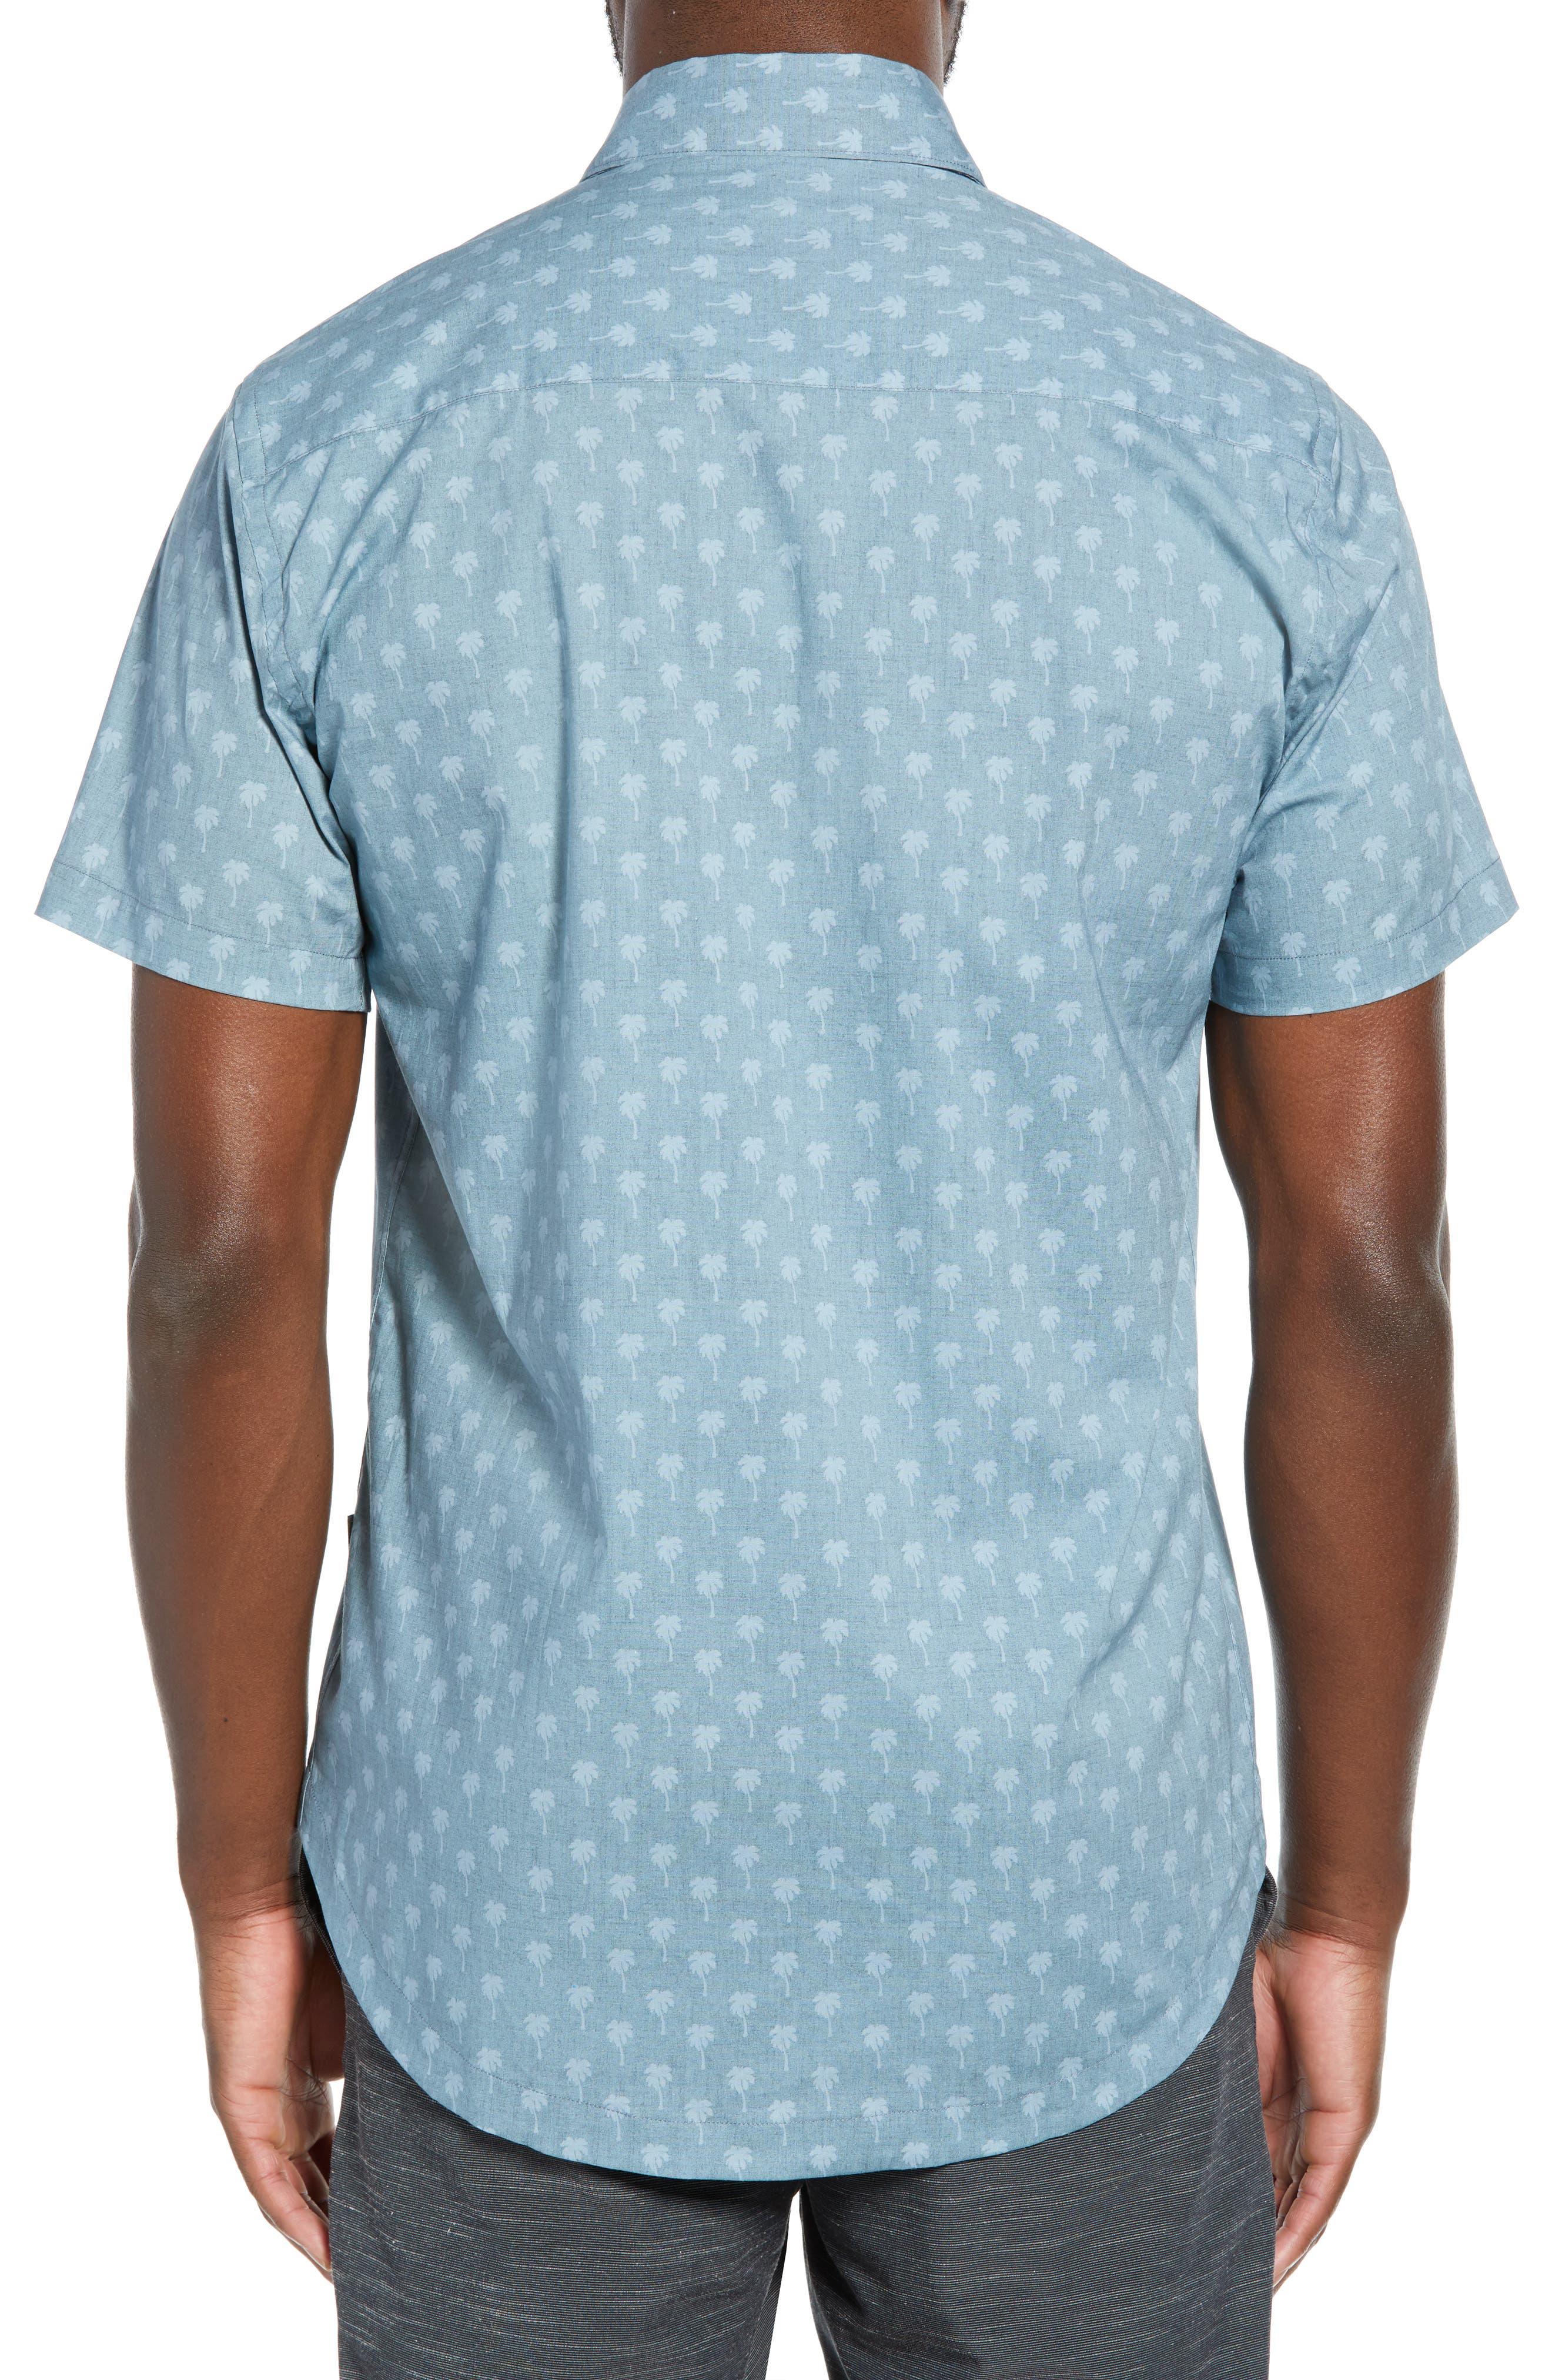 DEVEREUX, Cabana Regular Fit Sport Shirt, Alternate thumbnail 3, color, PALMS